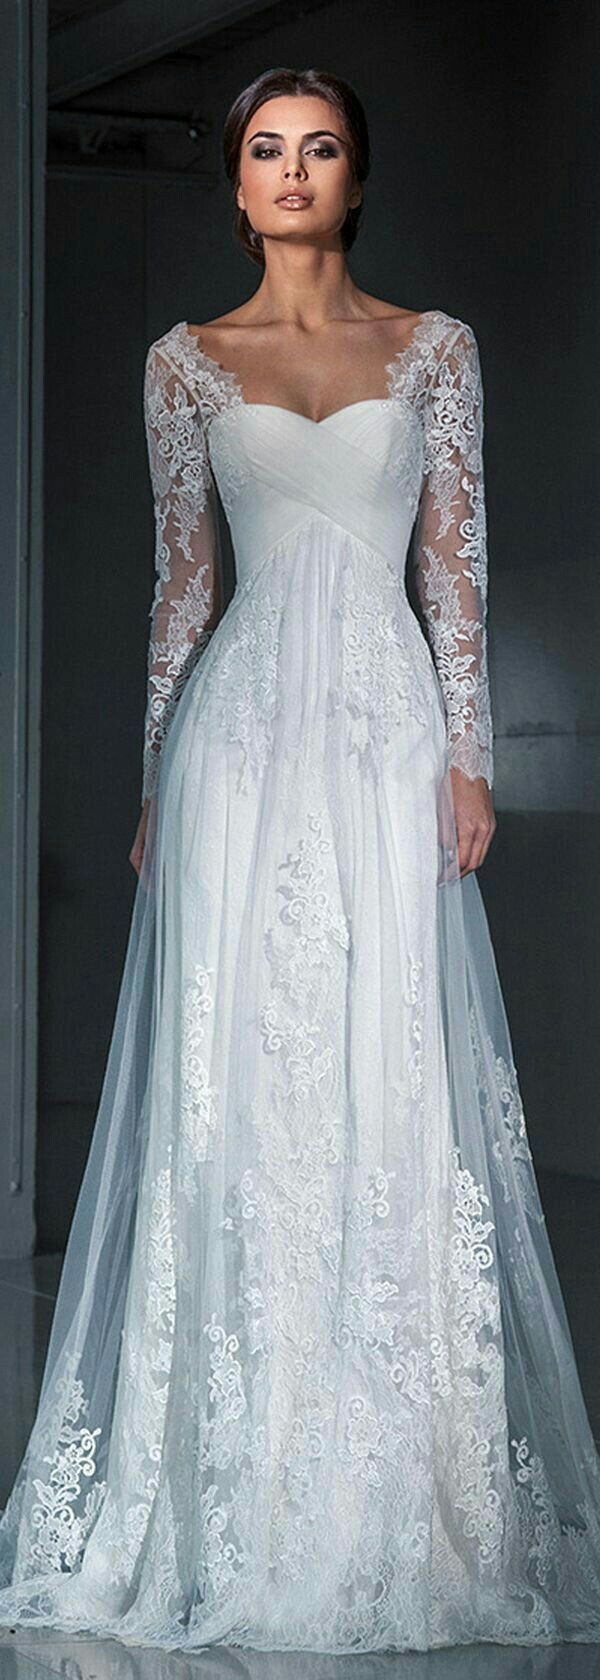 Mejores 199 imágenes de Wedding Dresses en Pinterest